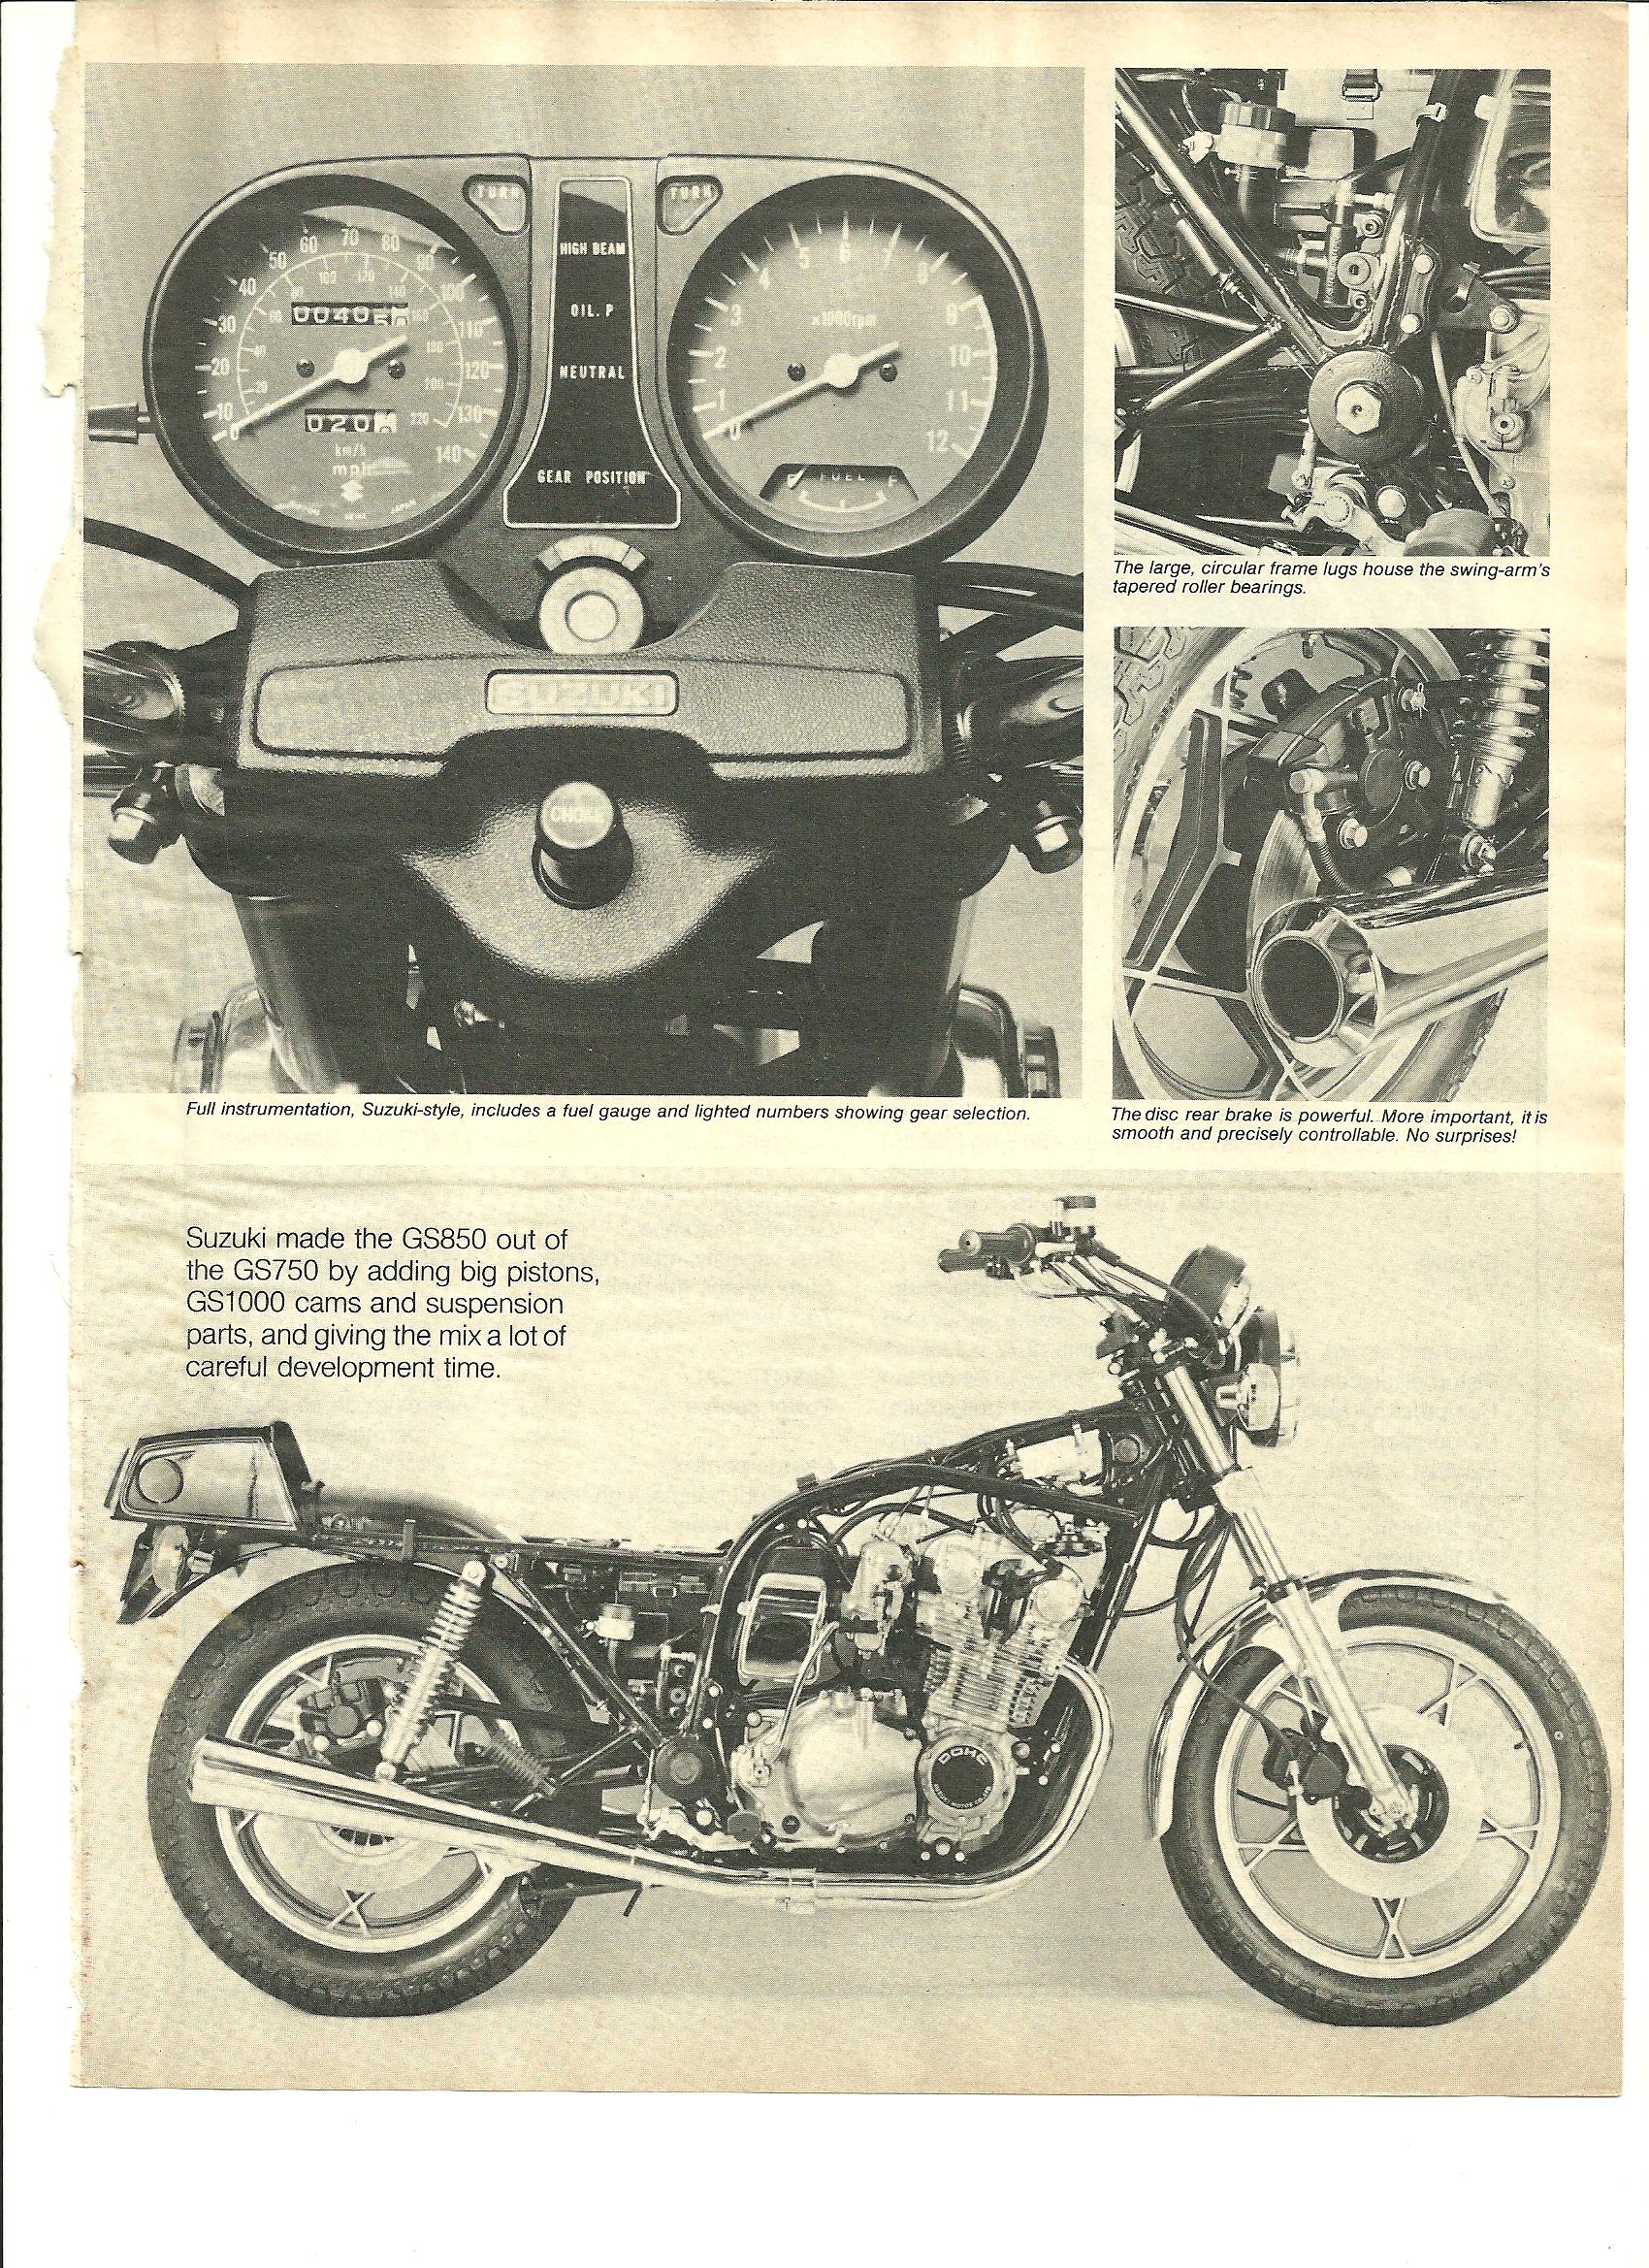 1979 Suzuki GS850 road test — Ye Olde Cycle Shoppe